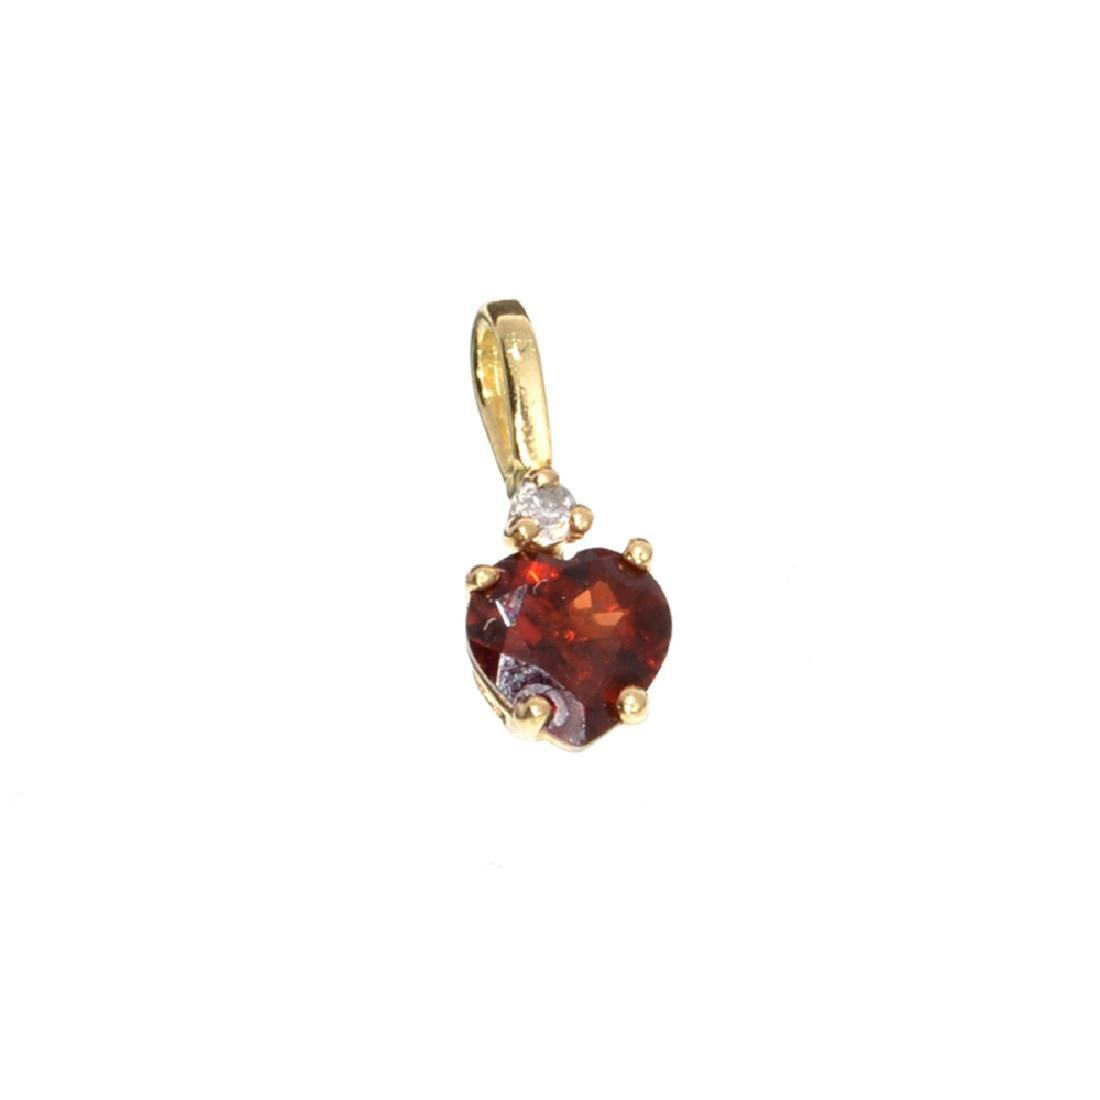 APP: 0.5k Fine Jewelry 14 kt. Gold, 0.50CT. Almandite